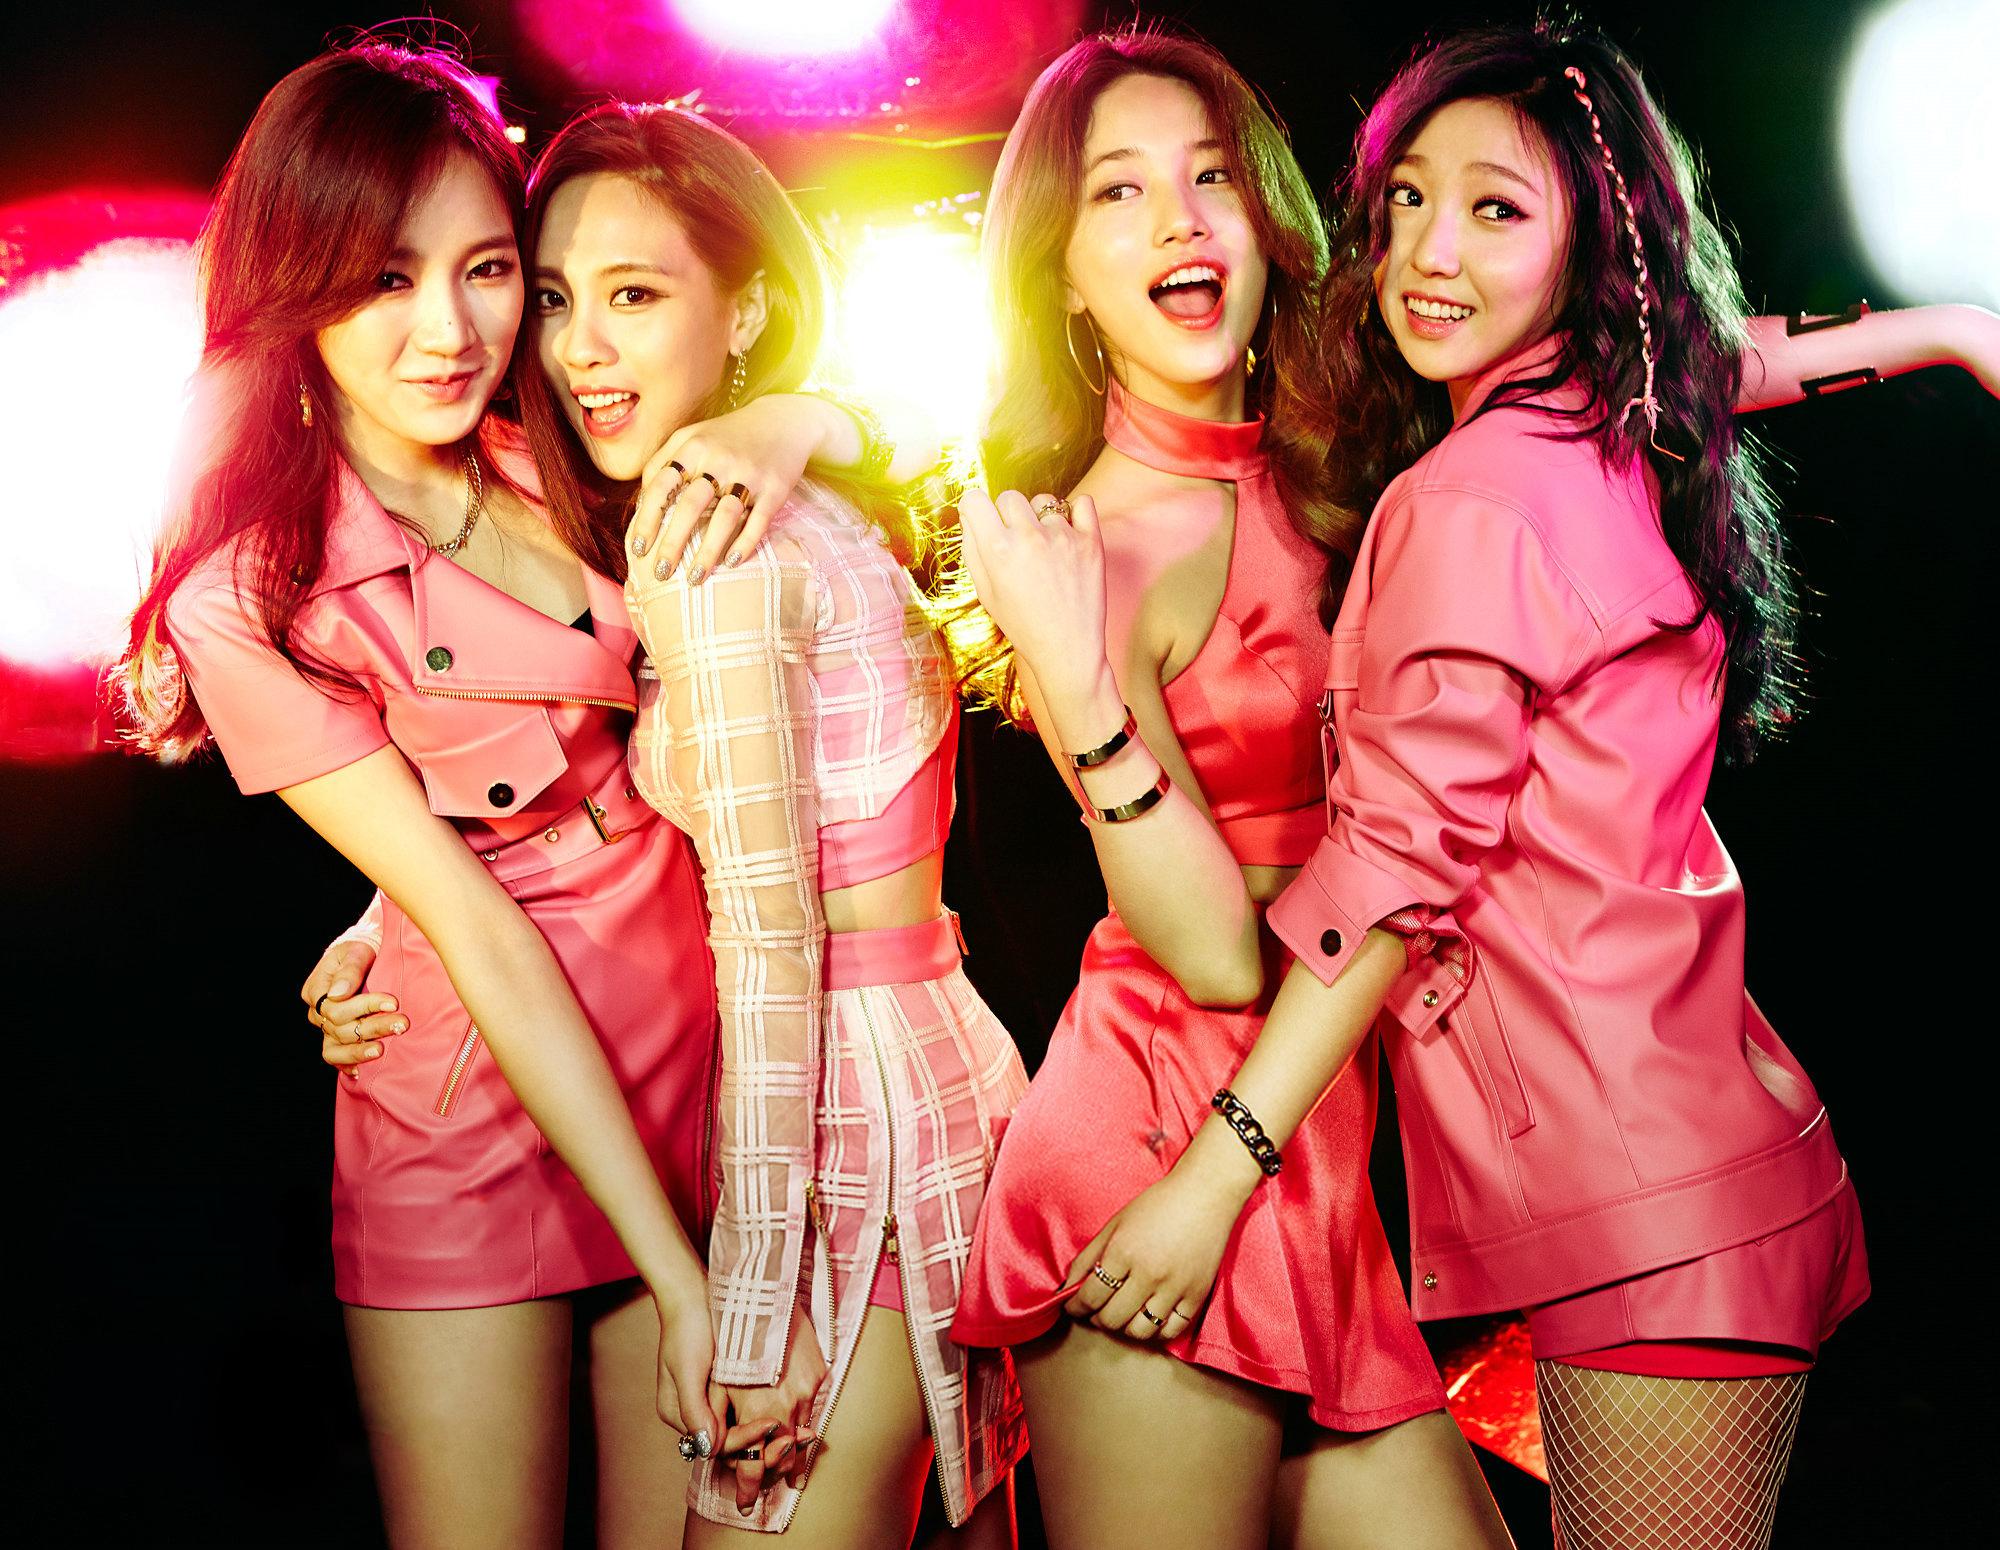 http://korean-cute.sosugary.com/albums/userpics/10001/ioJXCk2CCH4yj.jpg